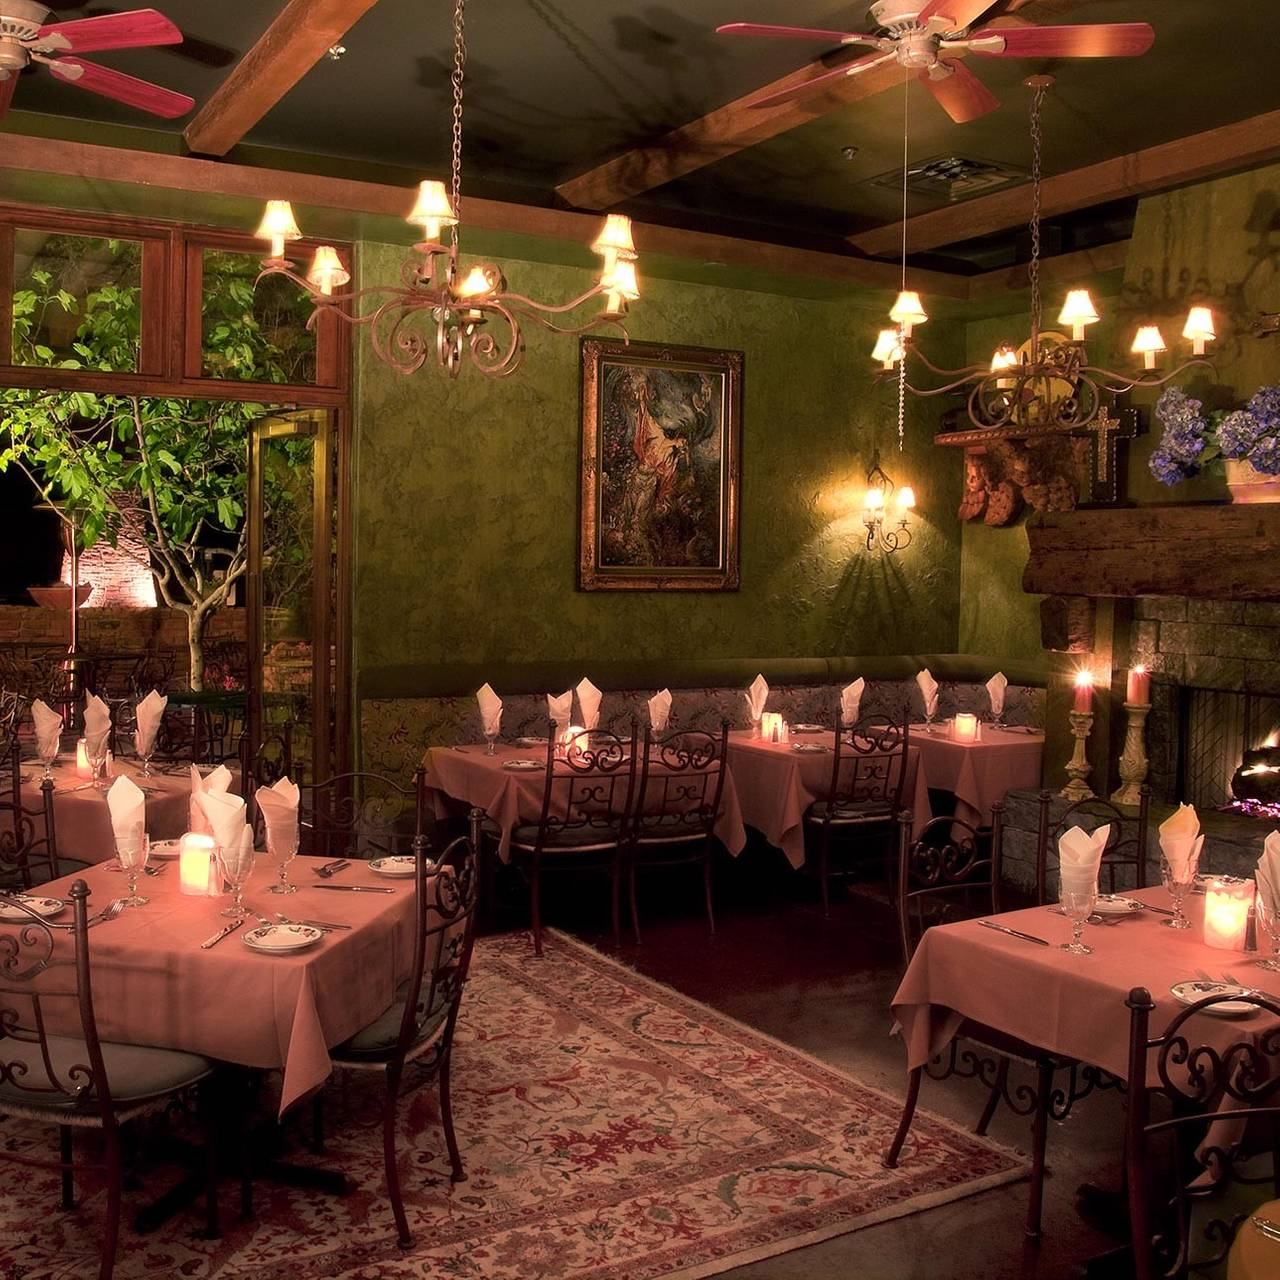 Cucina Rustica Restaurant - Sedona, AZ | OpenTable